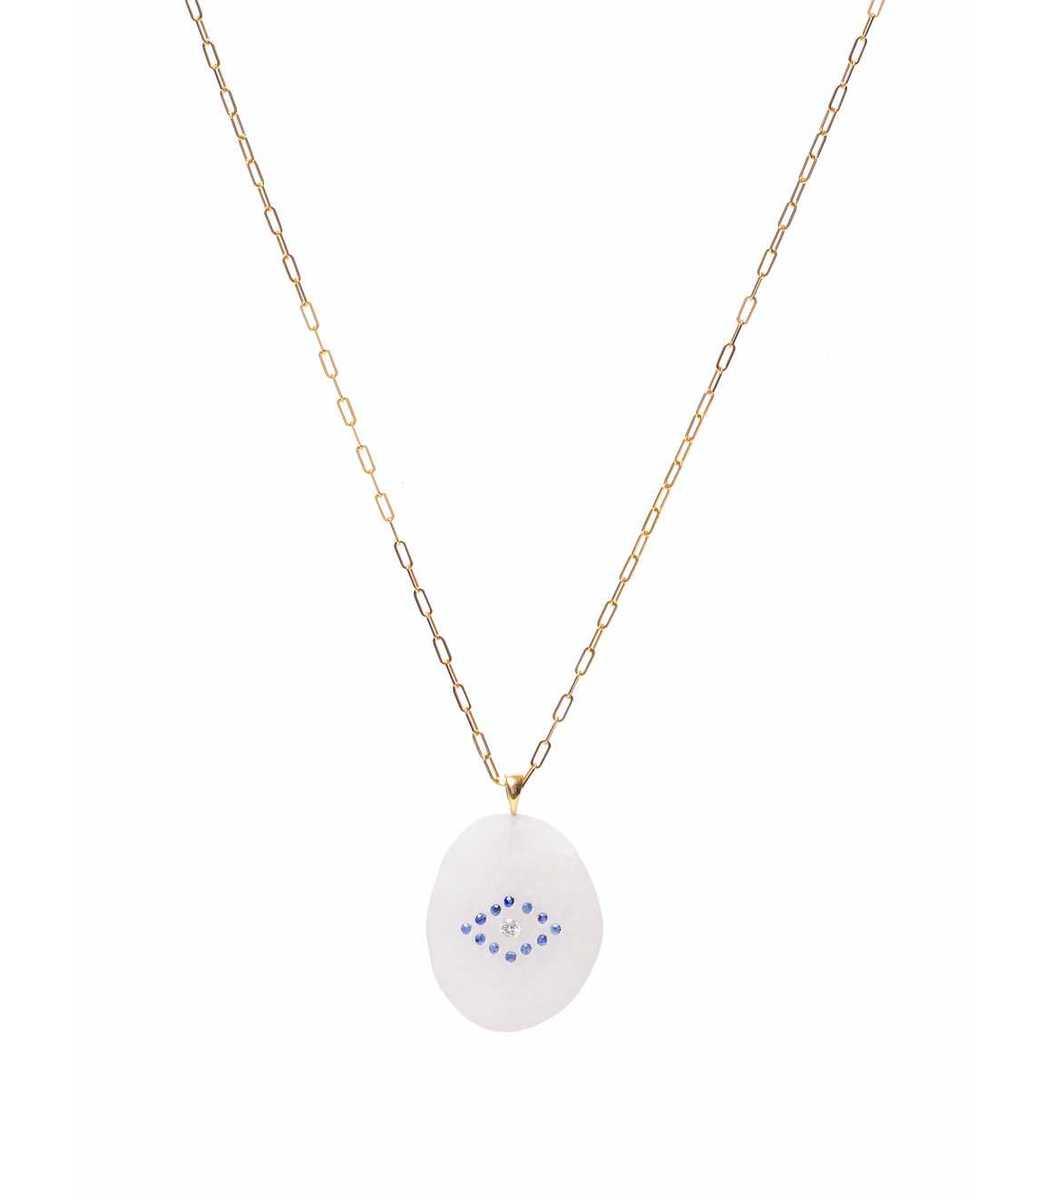 Cvc Stones one of a kind evil eye necklace